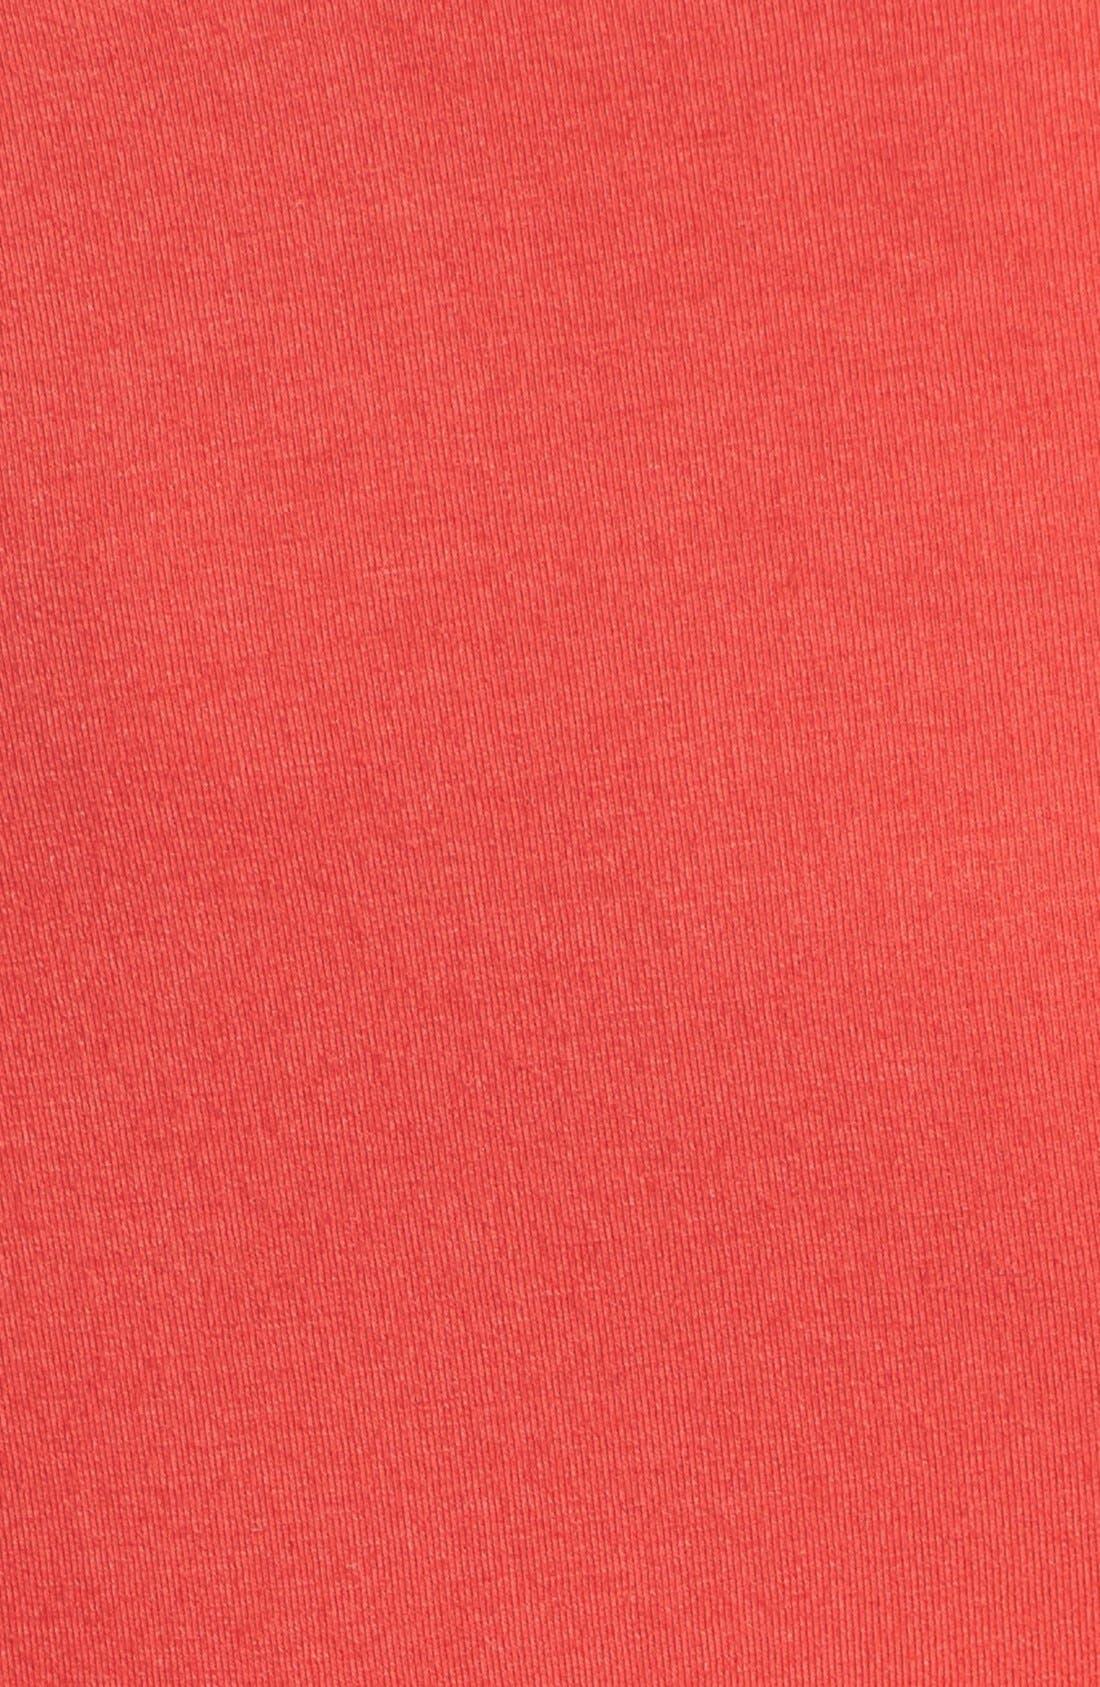 Alternate Image 3  - Splendid Strapless Knit Maxi Dress